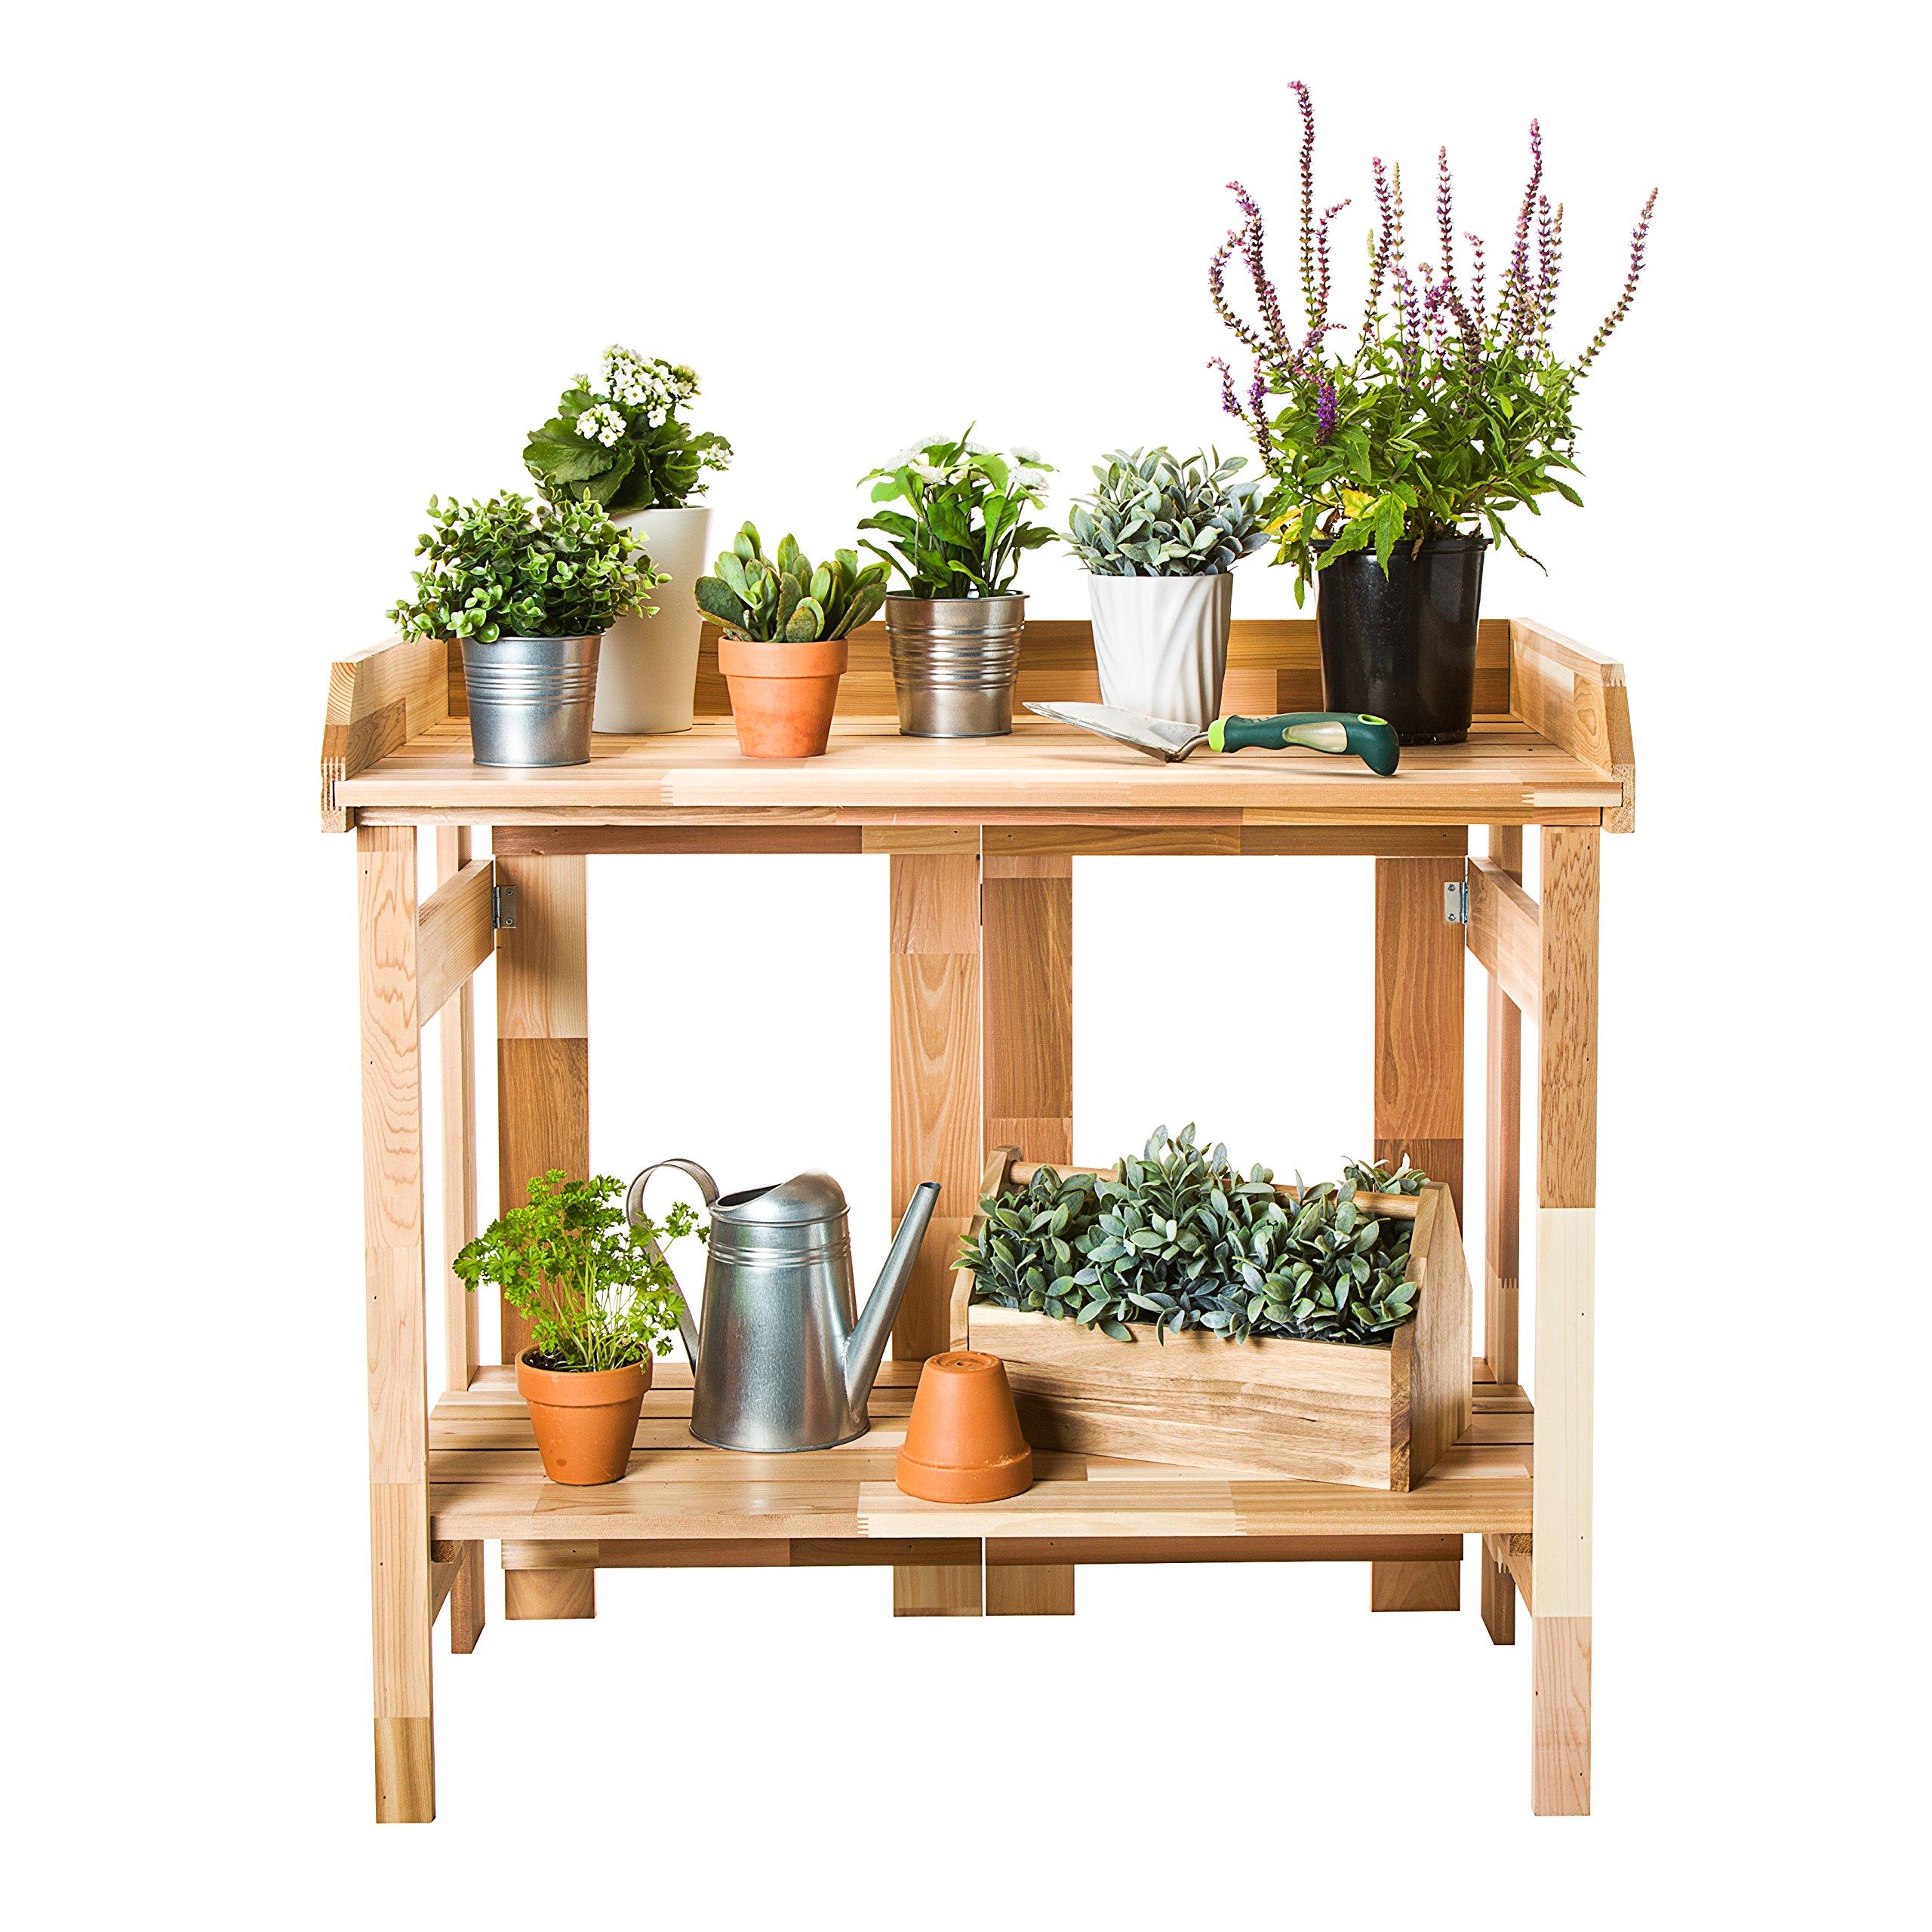 CedarCraft Folding Potting Bench & Event Table